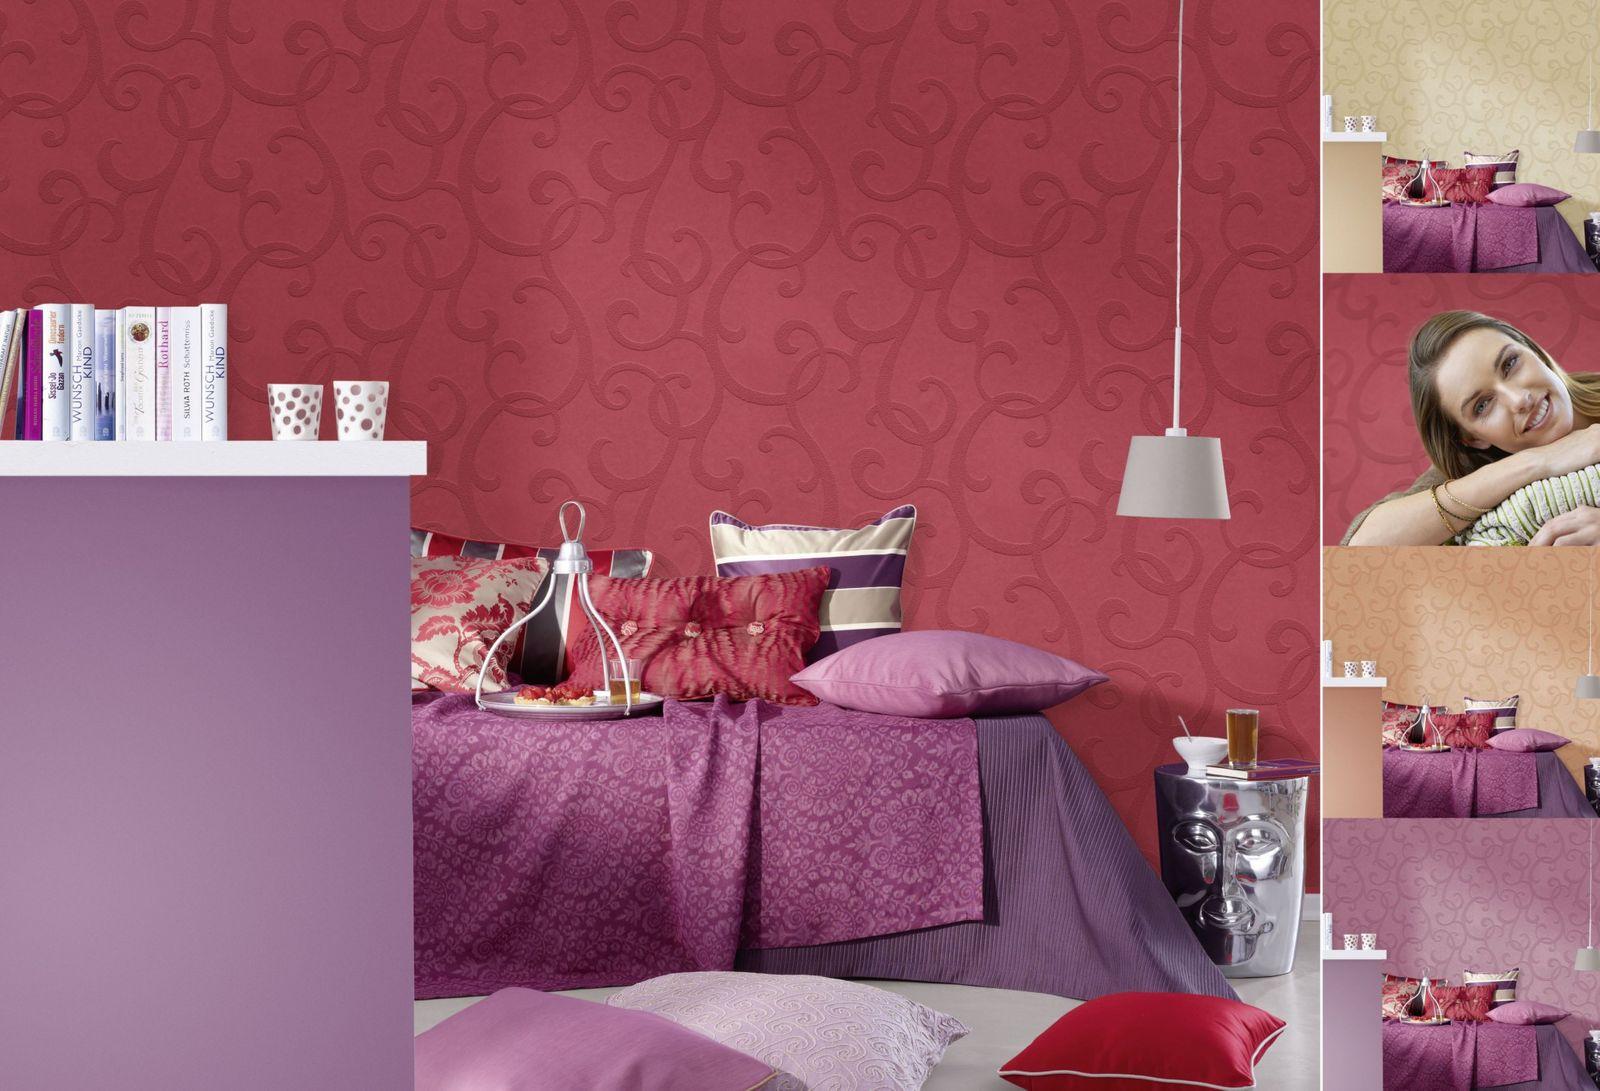 vliestapete berstreichbar ranken wei patent decor 3d 9431. Black Bedroom Furniture Sets. Home Design Ideas